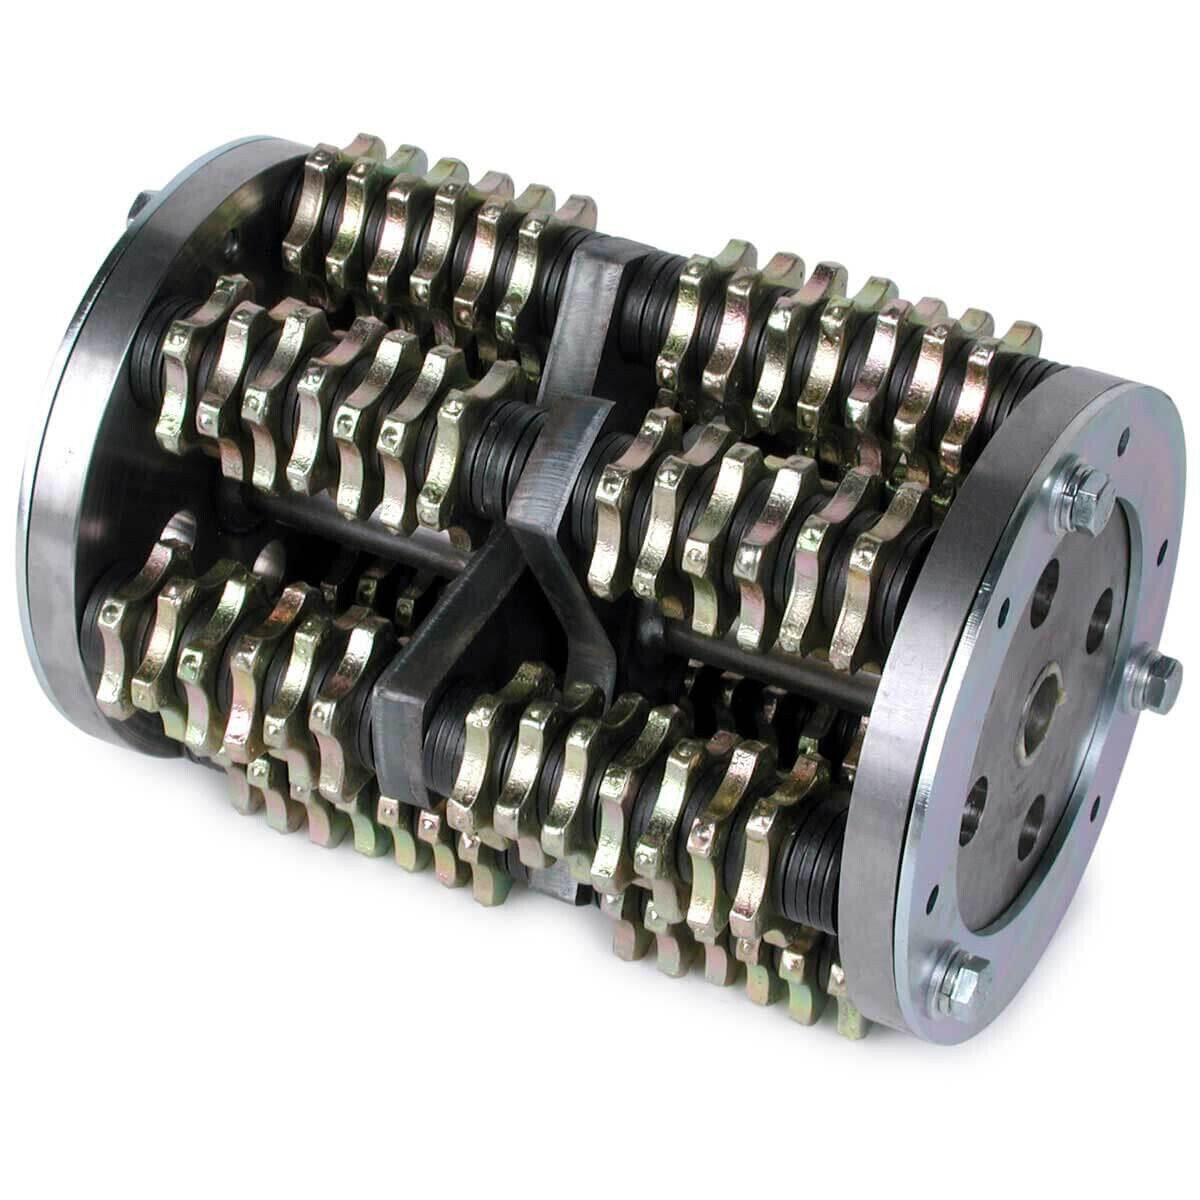 MK Diamond 5 Point Carbide Cutters 158492